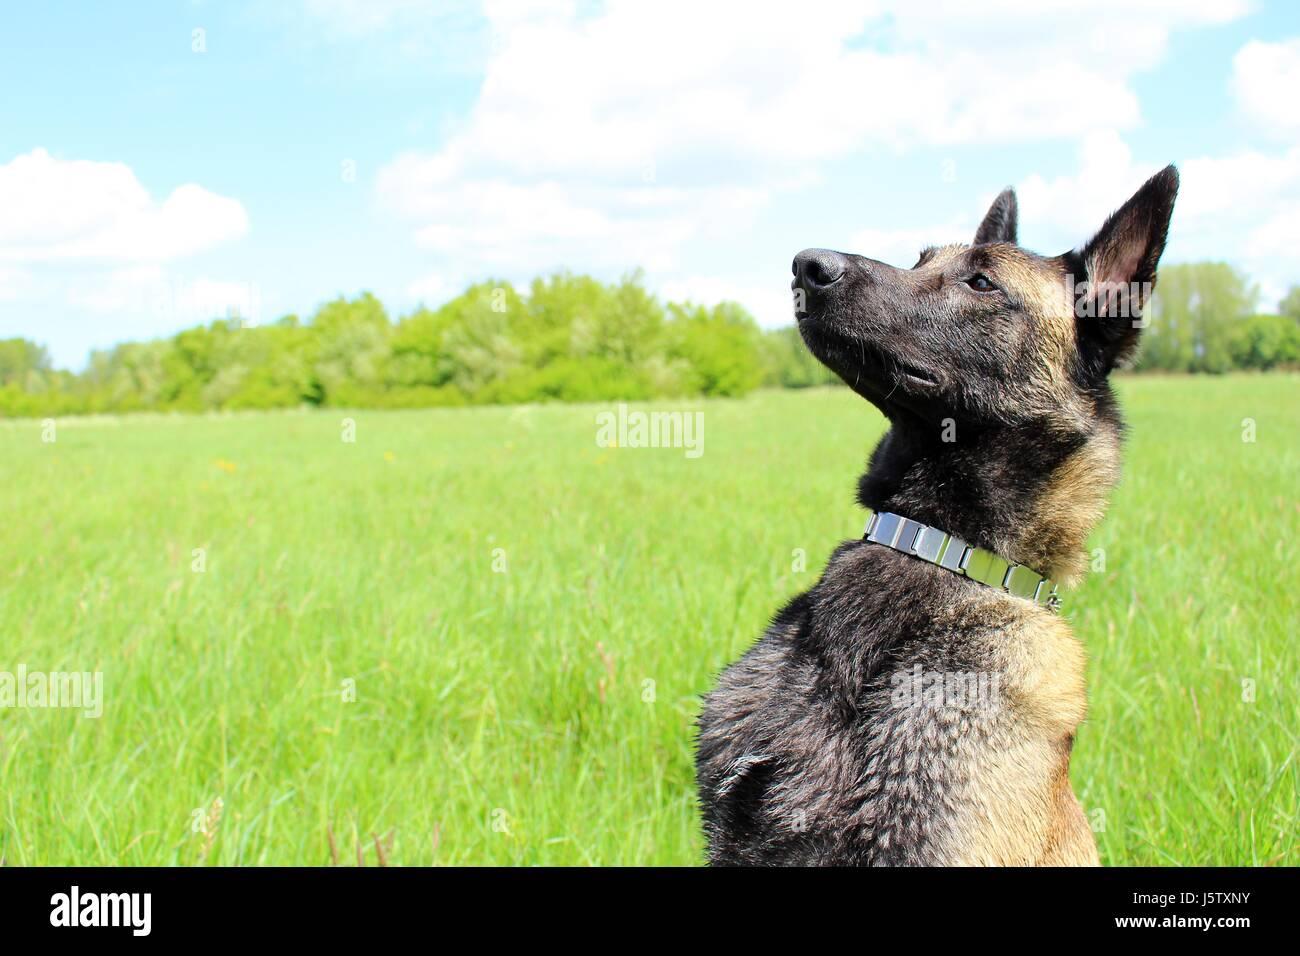 Army Dog Stock Photos & Army Dog Stock Images - Alamy